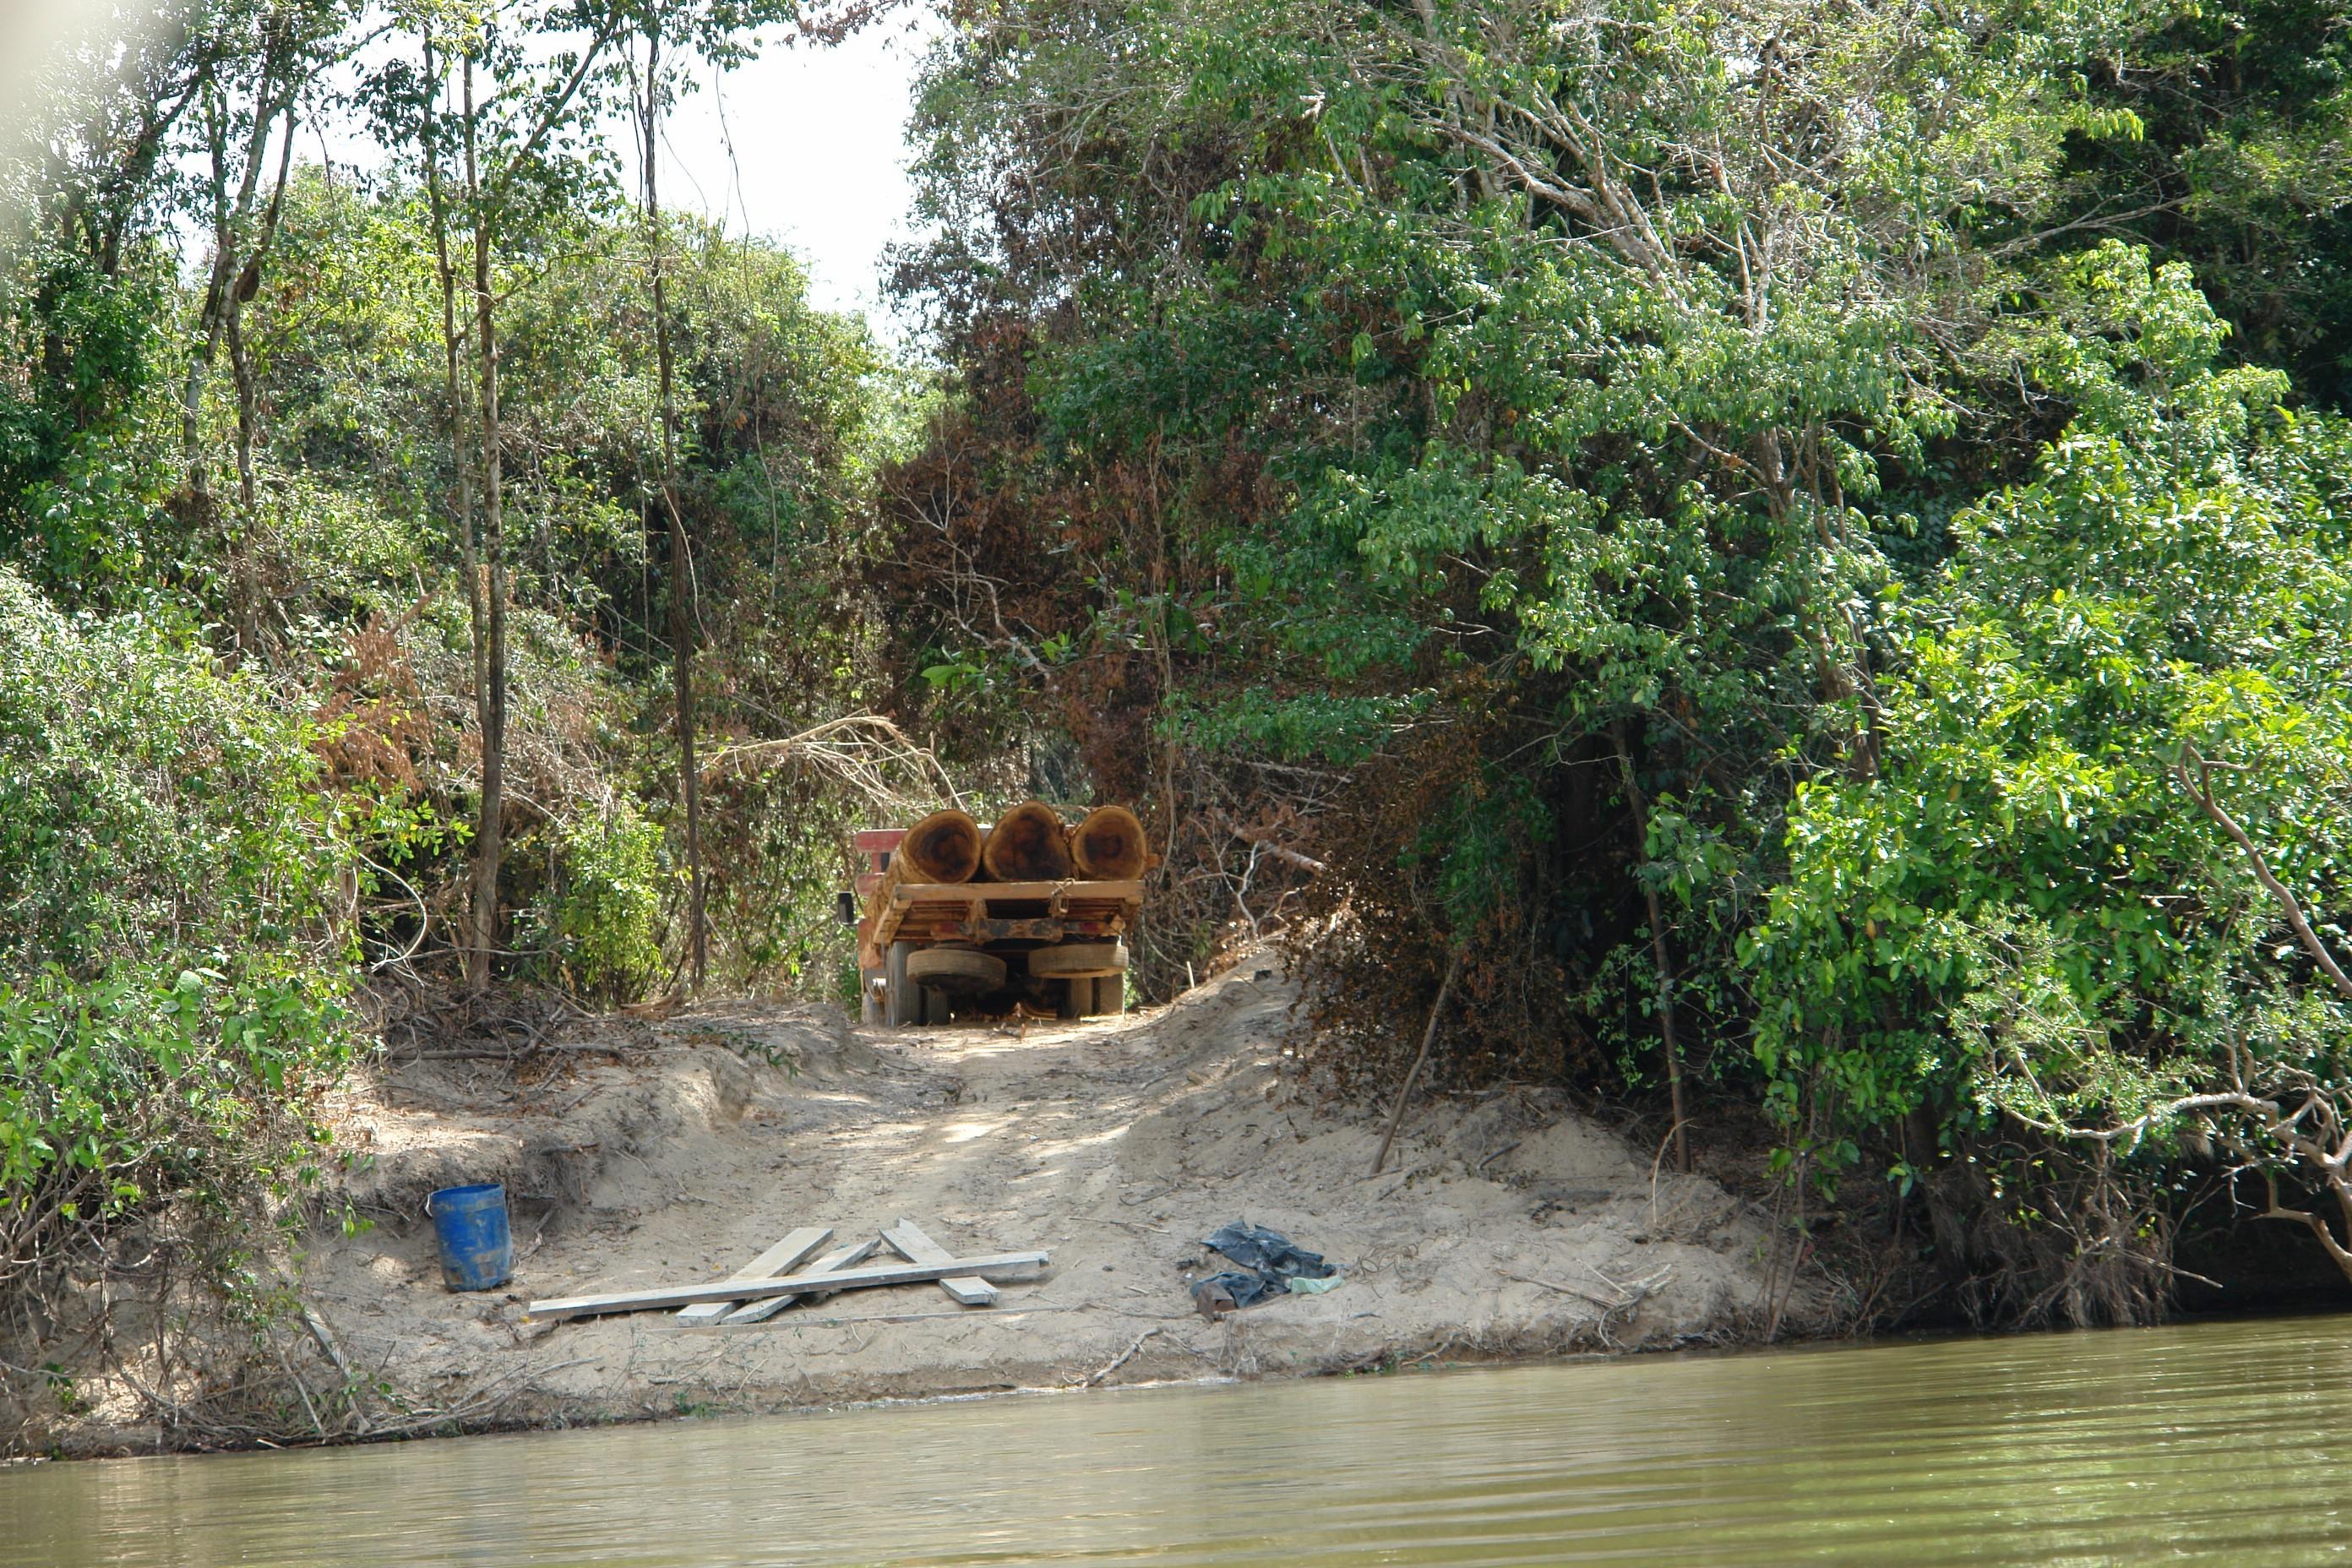 Desmatamento na margem do Rio Xingu. (Foto: Xingu Vivo)